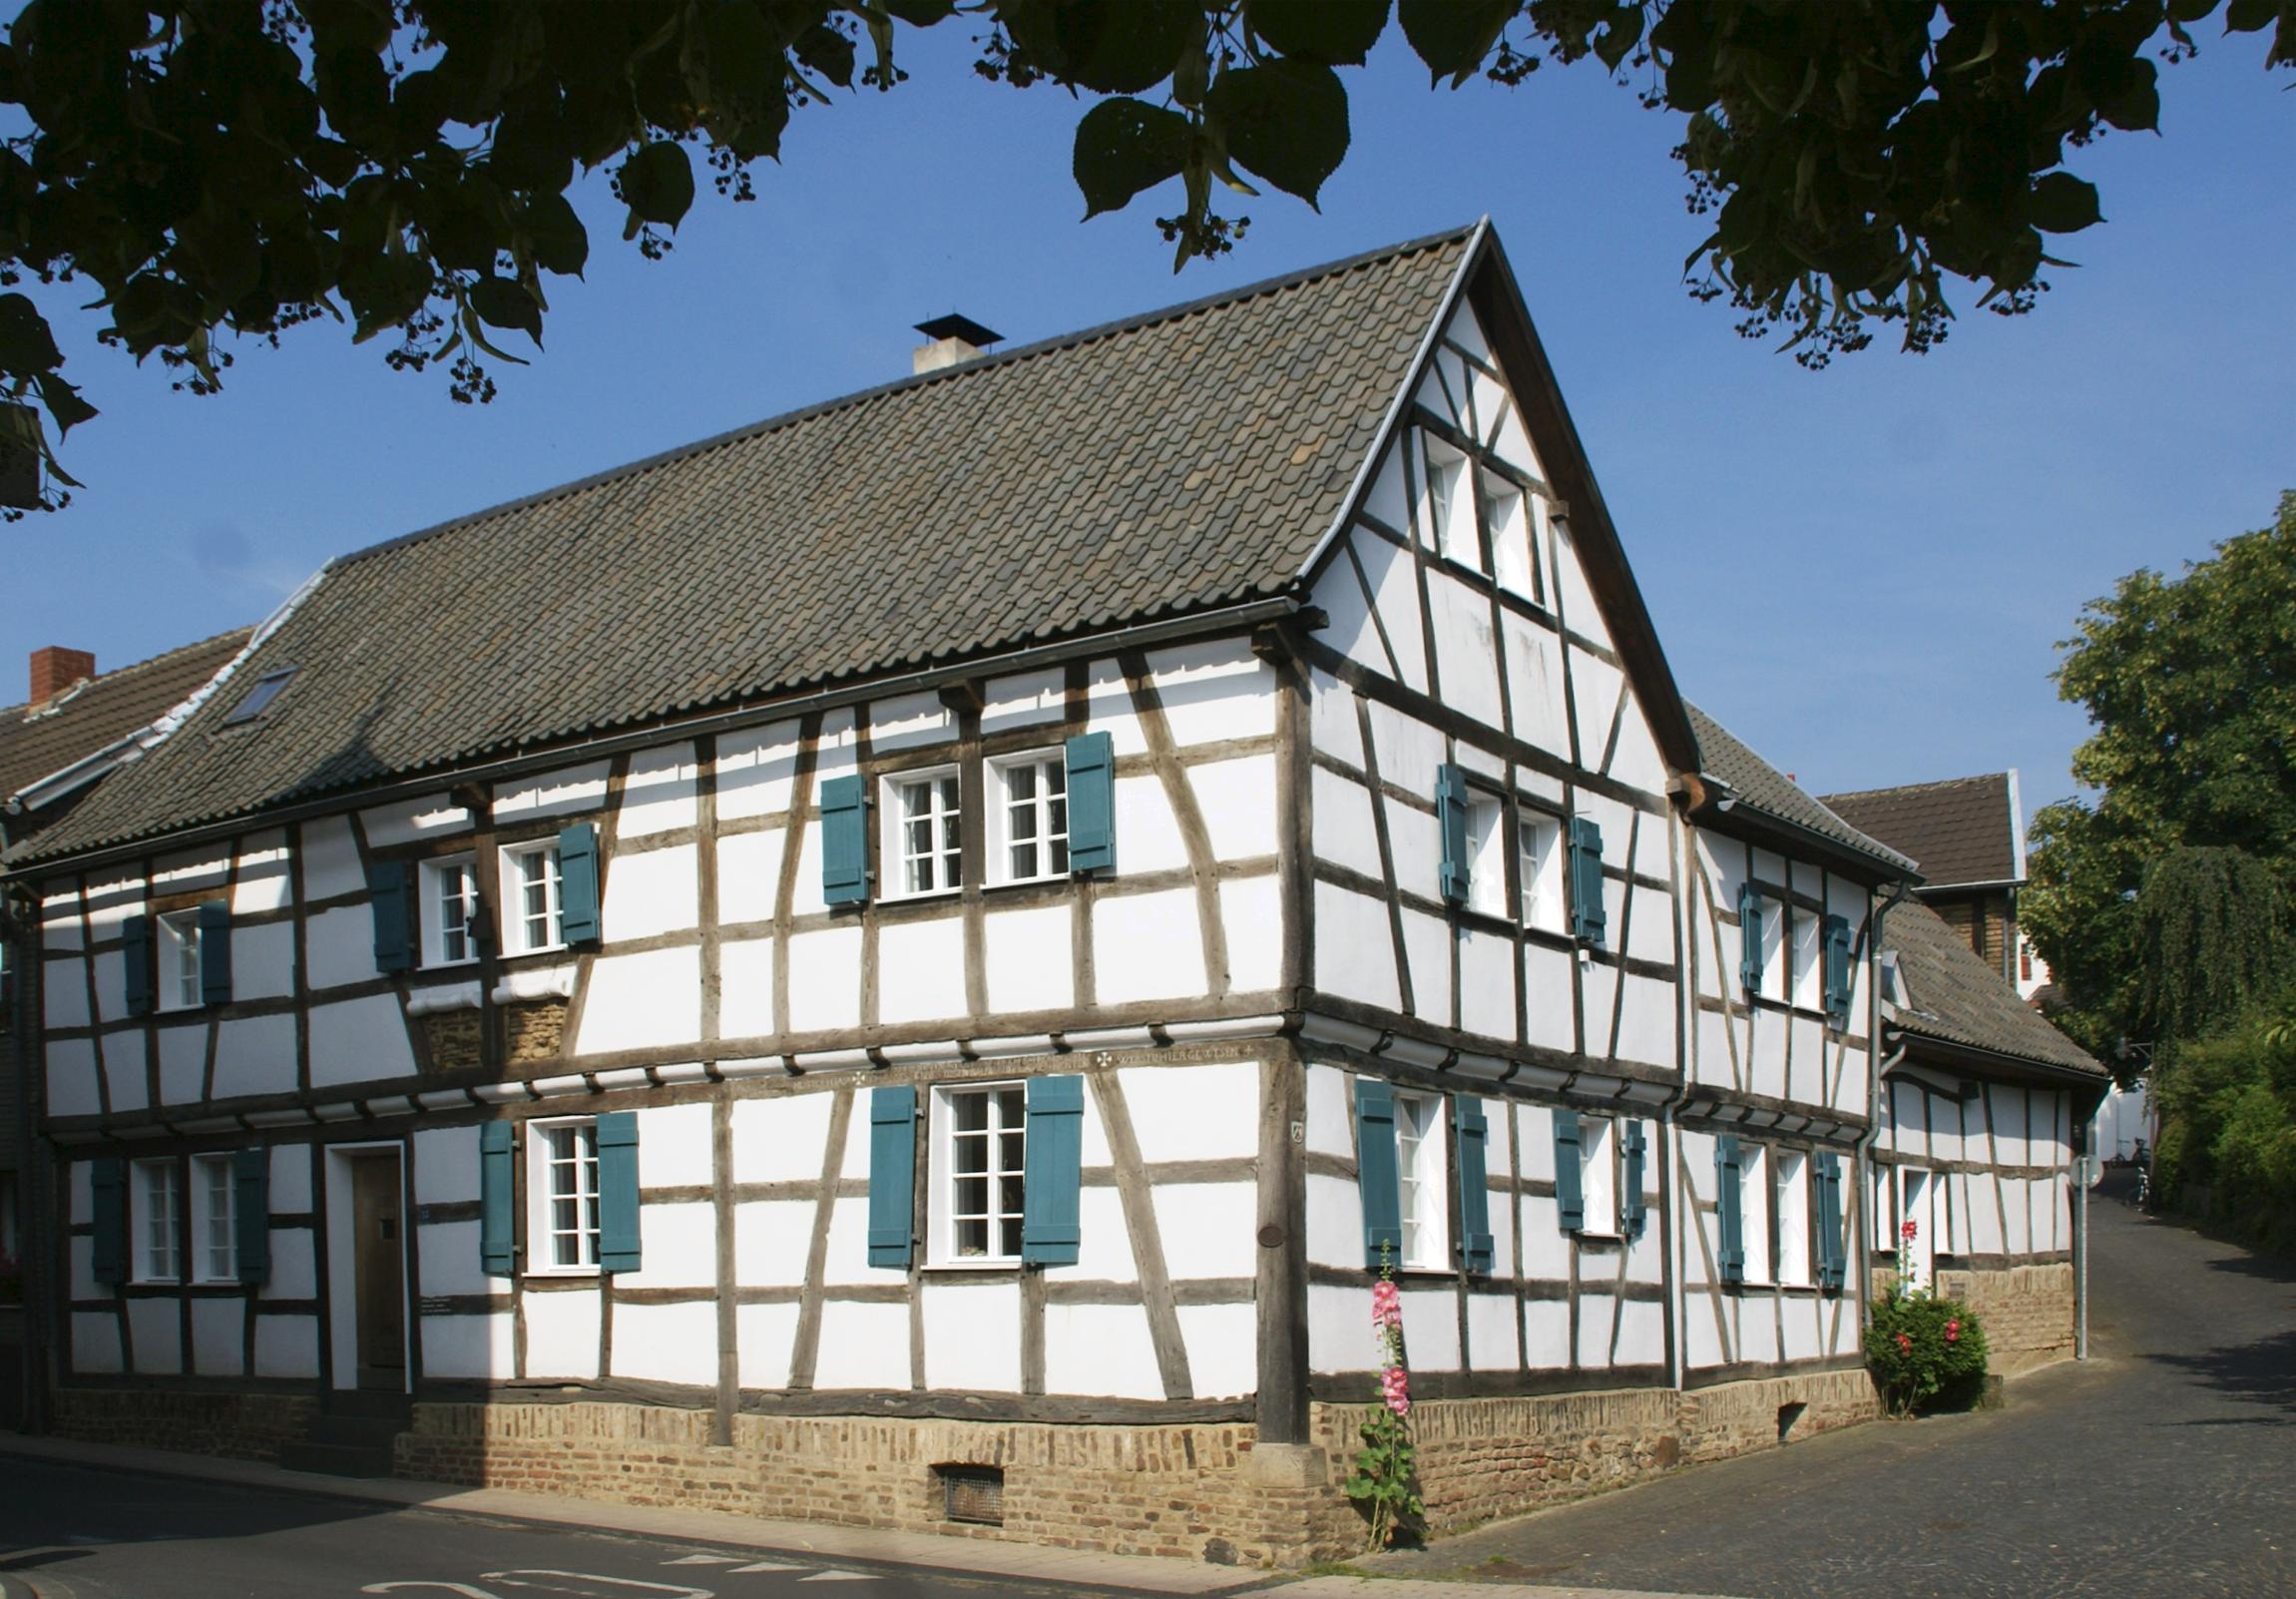 File:Alfter Fachwerkhaus Hertersplatz 13 (01).png - Wikimedia Commons